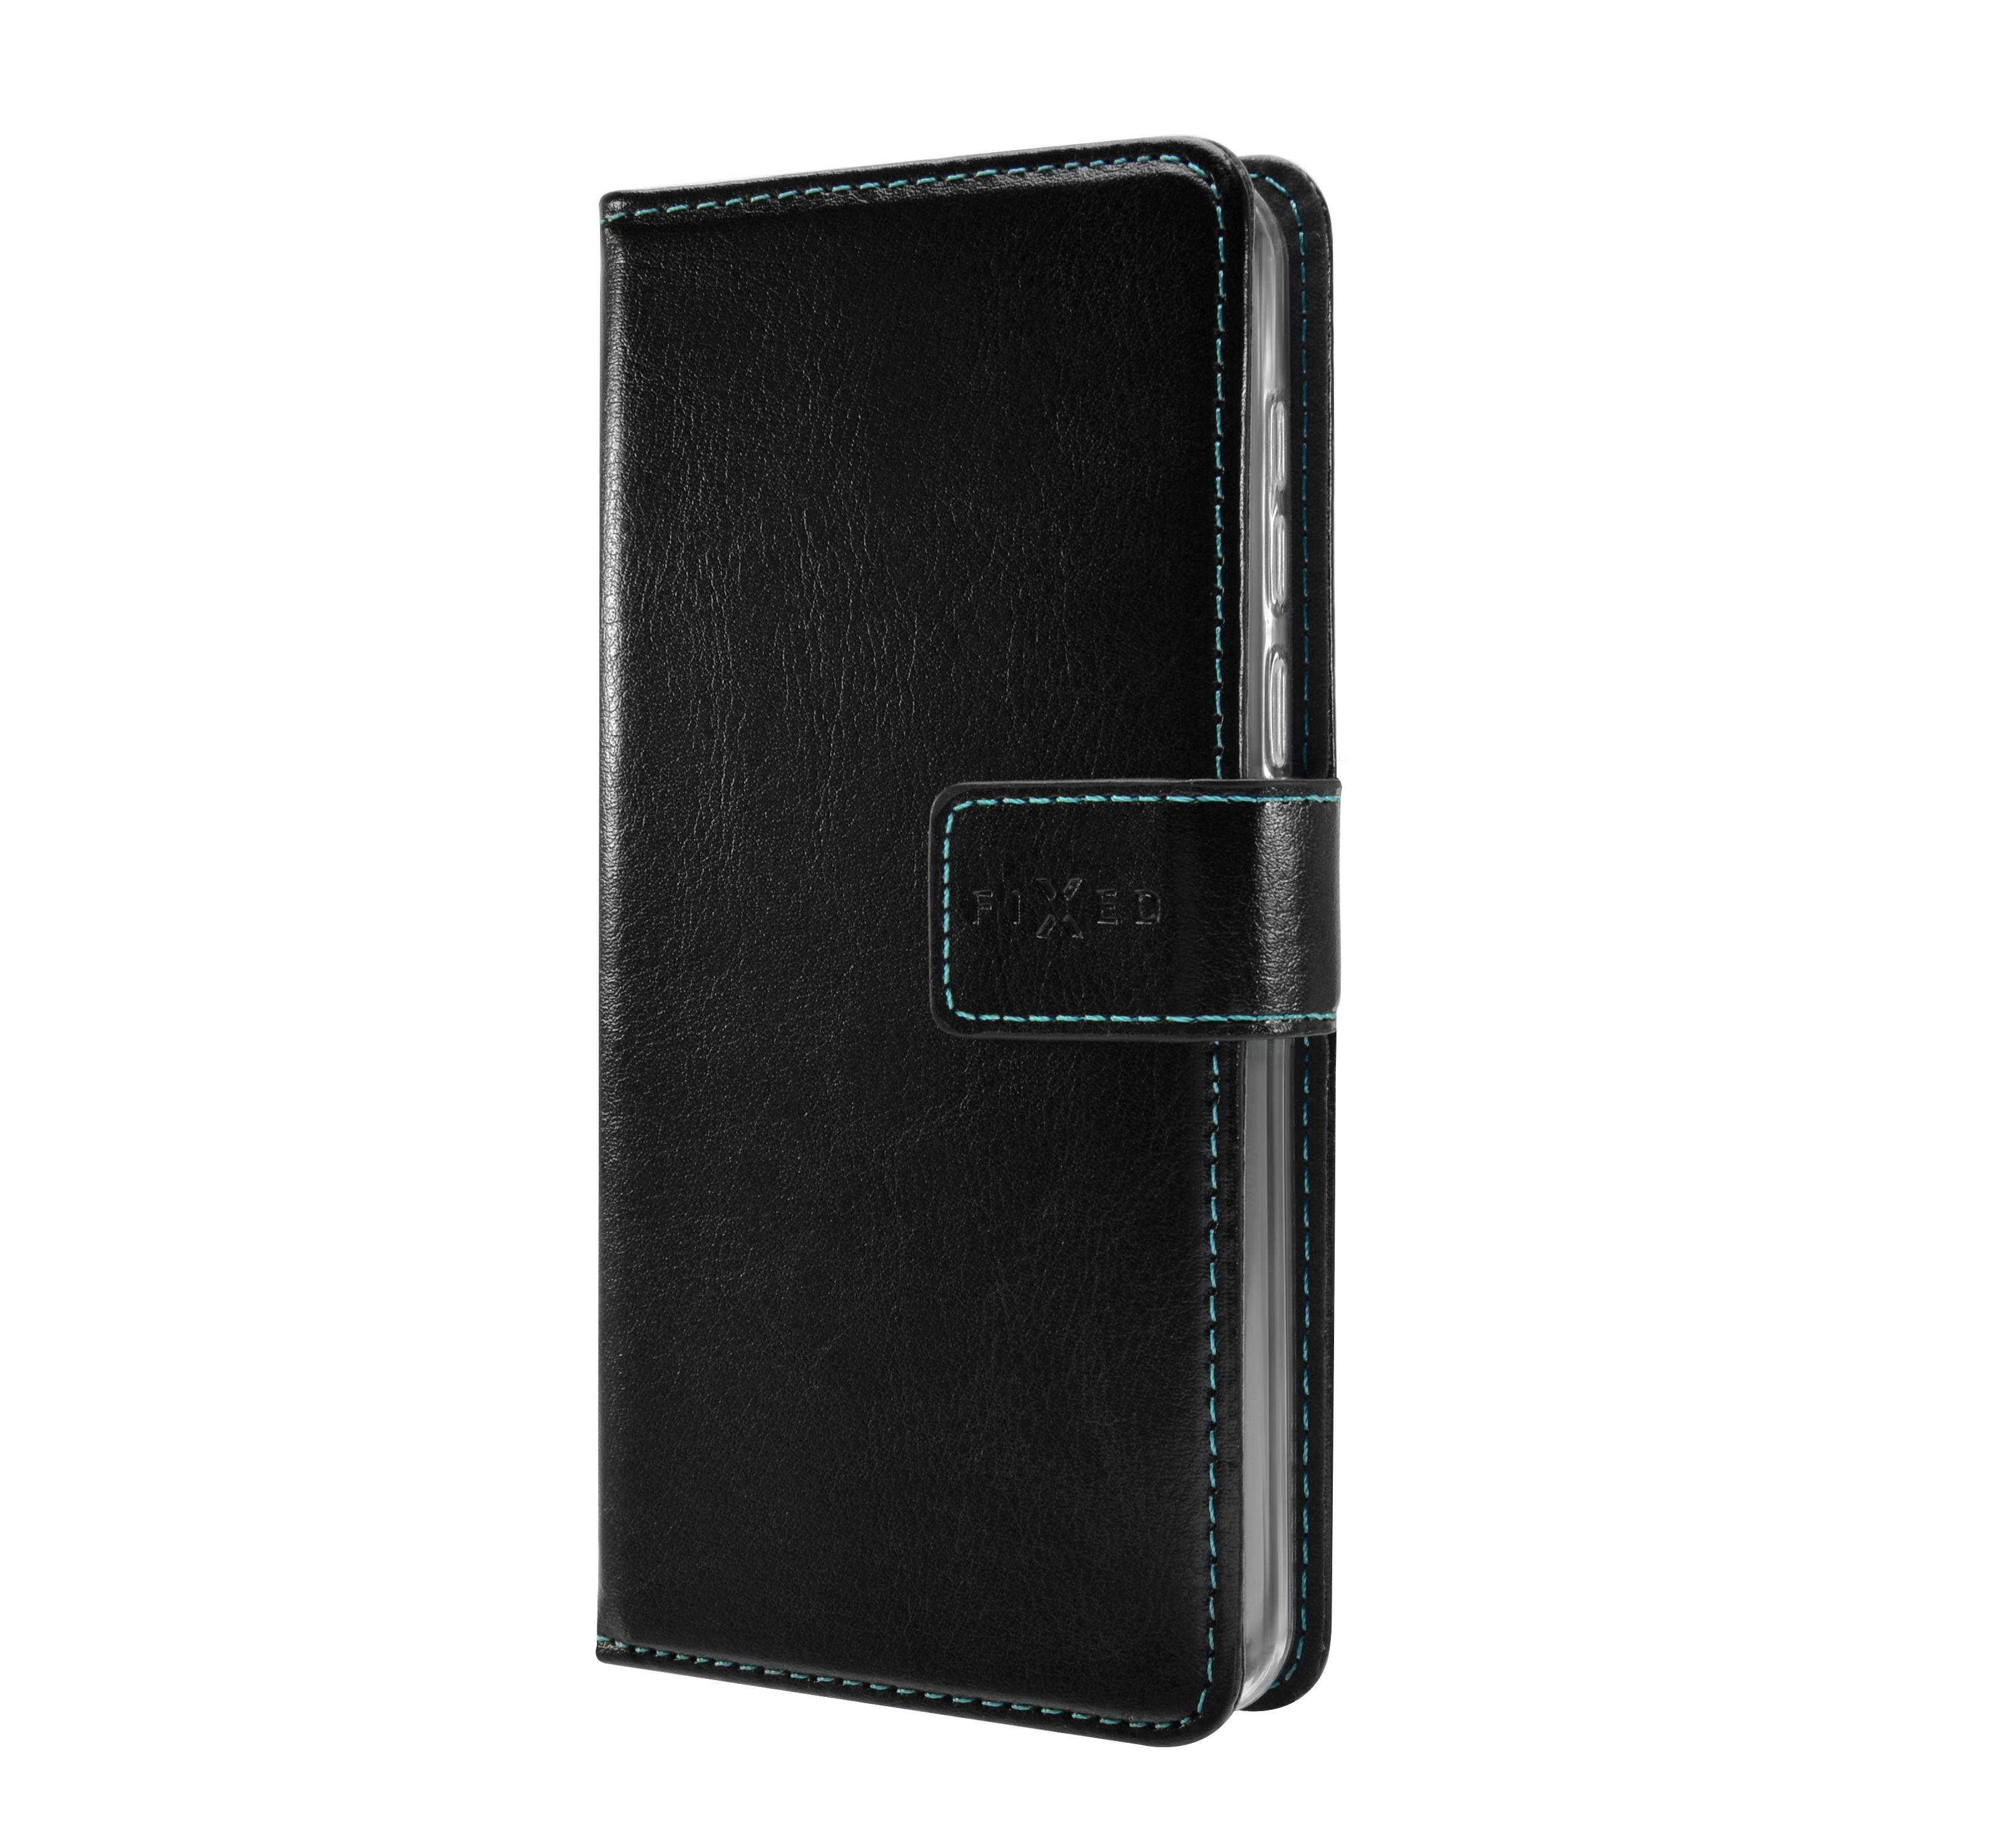 Pouzdro typu kniha FIXED Opus pro Motorola One Macro, černé